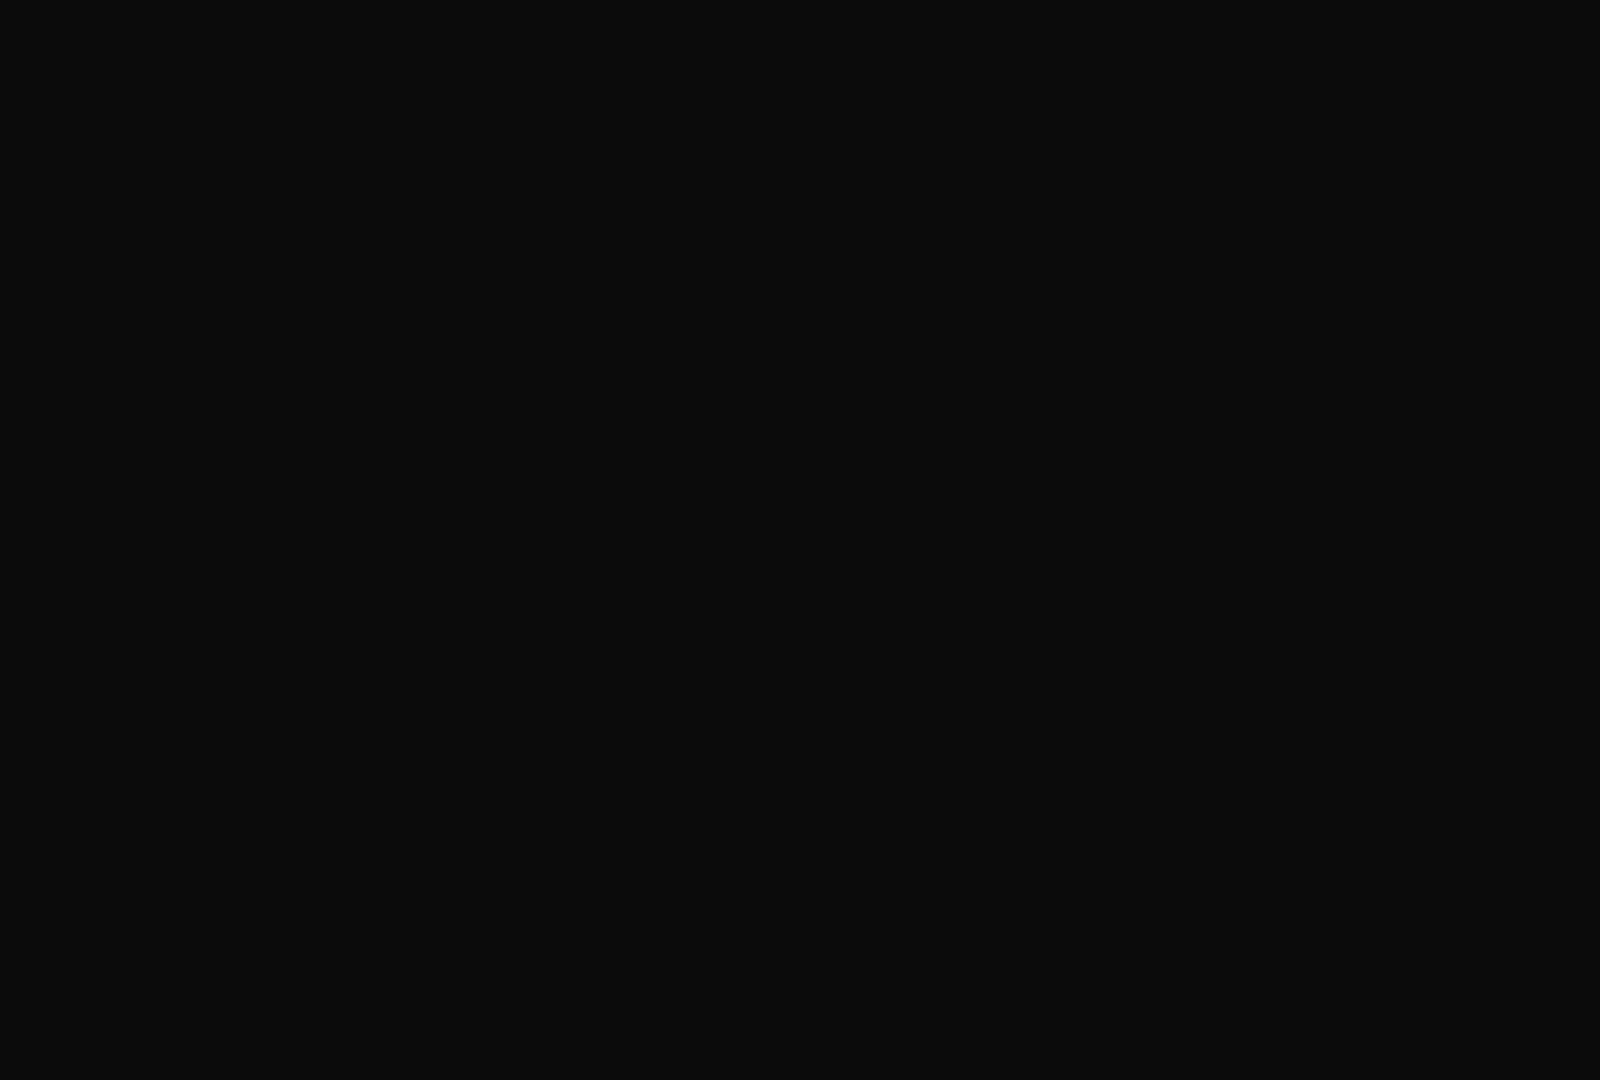 充血監督の深夜の運動会Vol.52 0  23連発 2